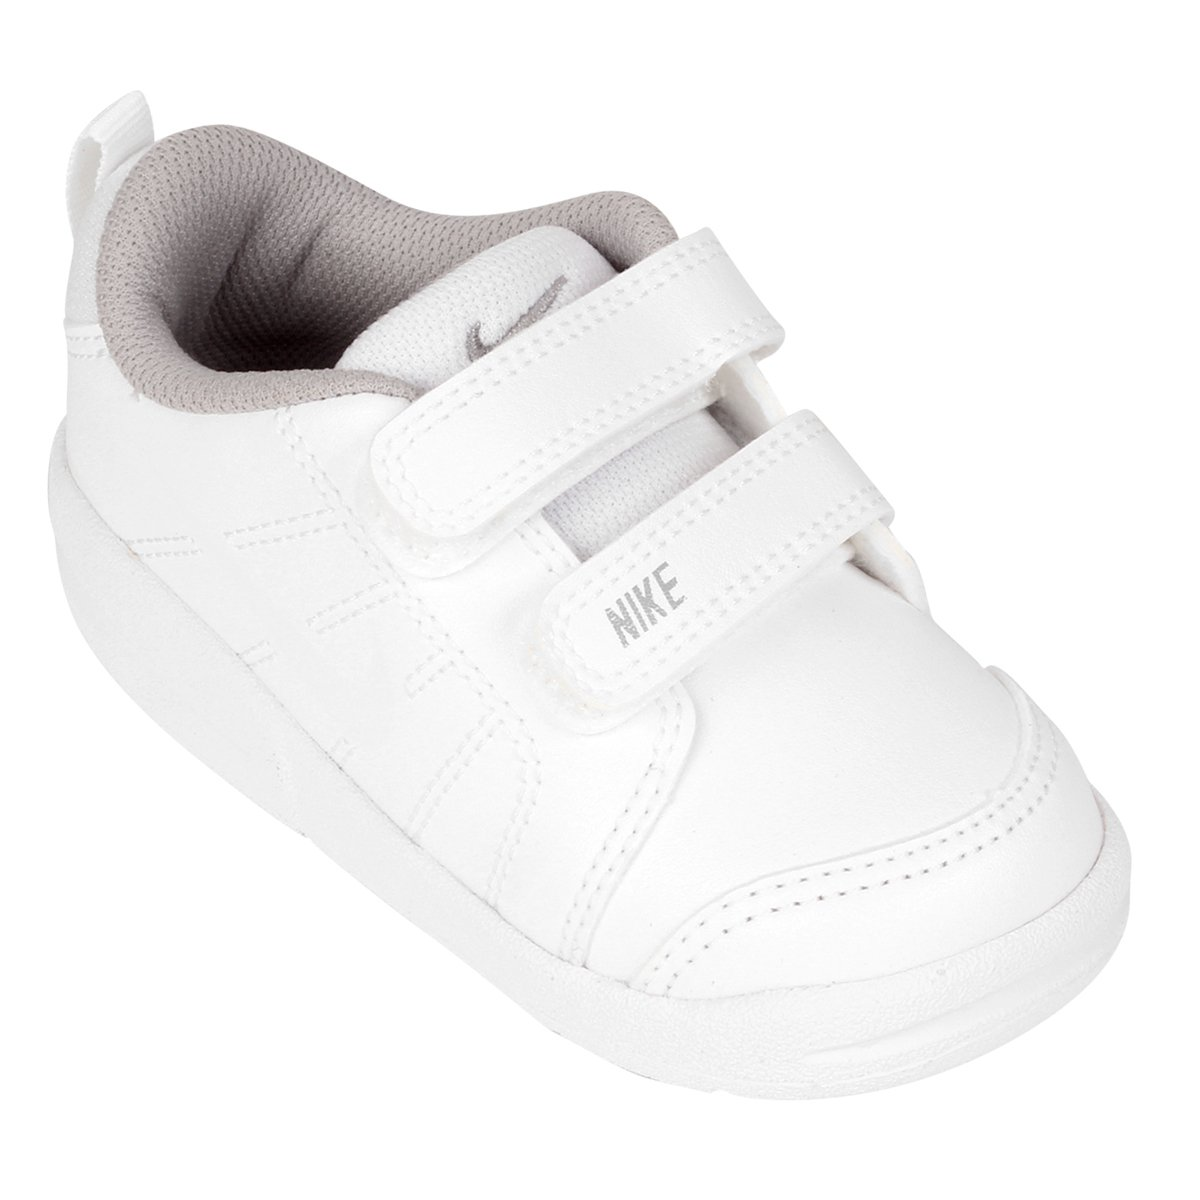 b0a8e536626 Tênis Infantil Nike Pico Lt Masculino. undefined